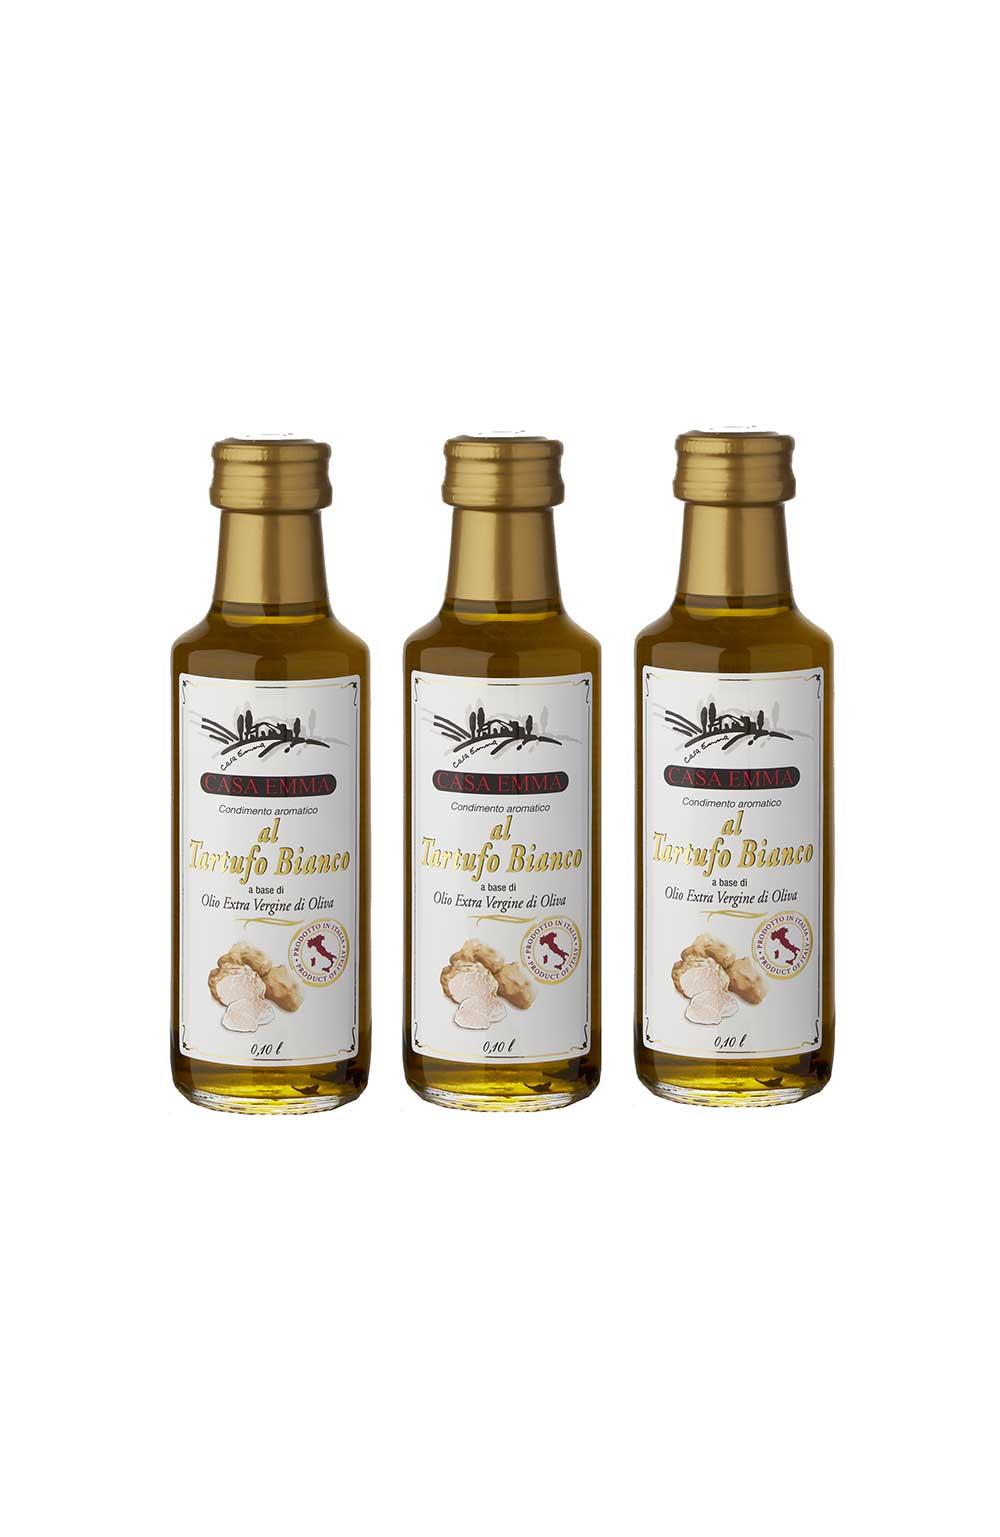 Olio-Extra-Vergine-d'Oliva-al-tartufo-bianco